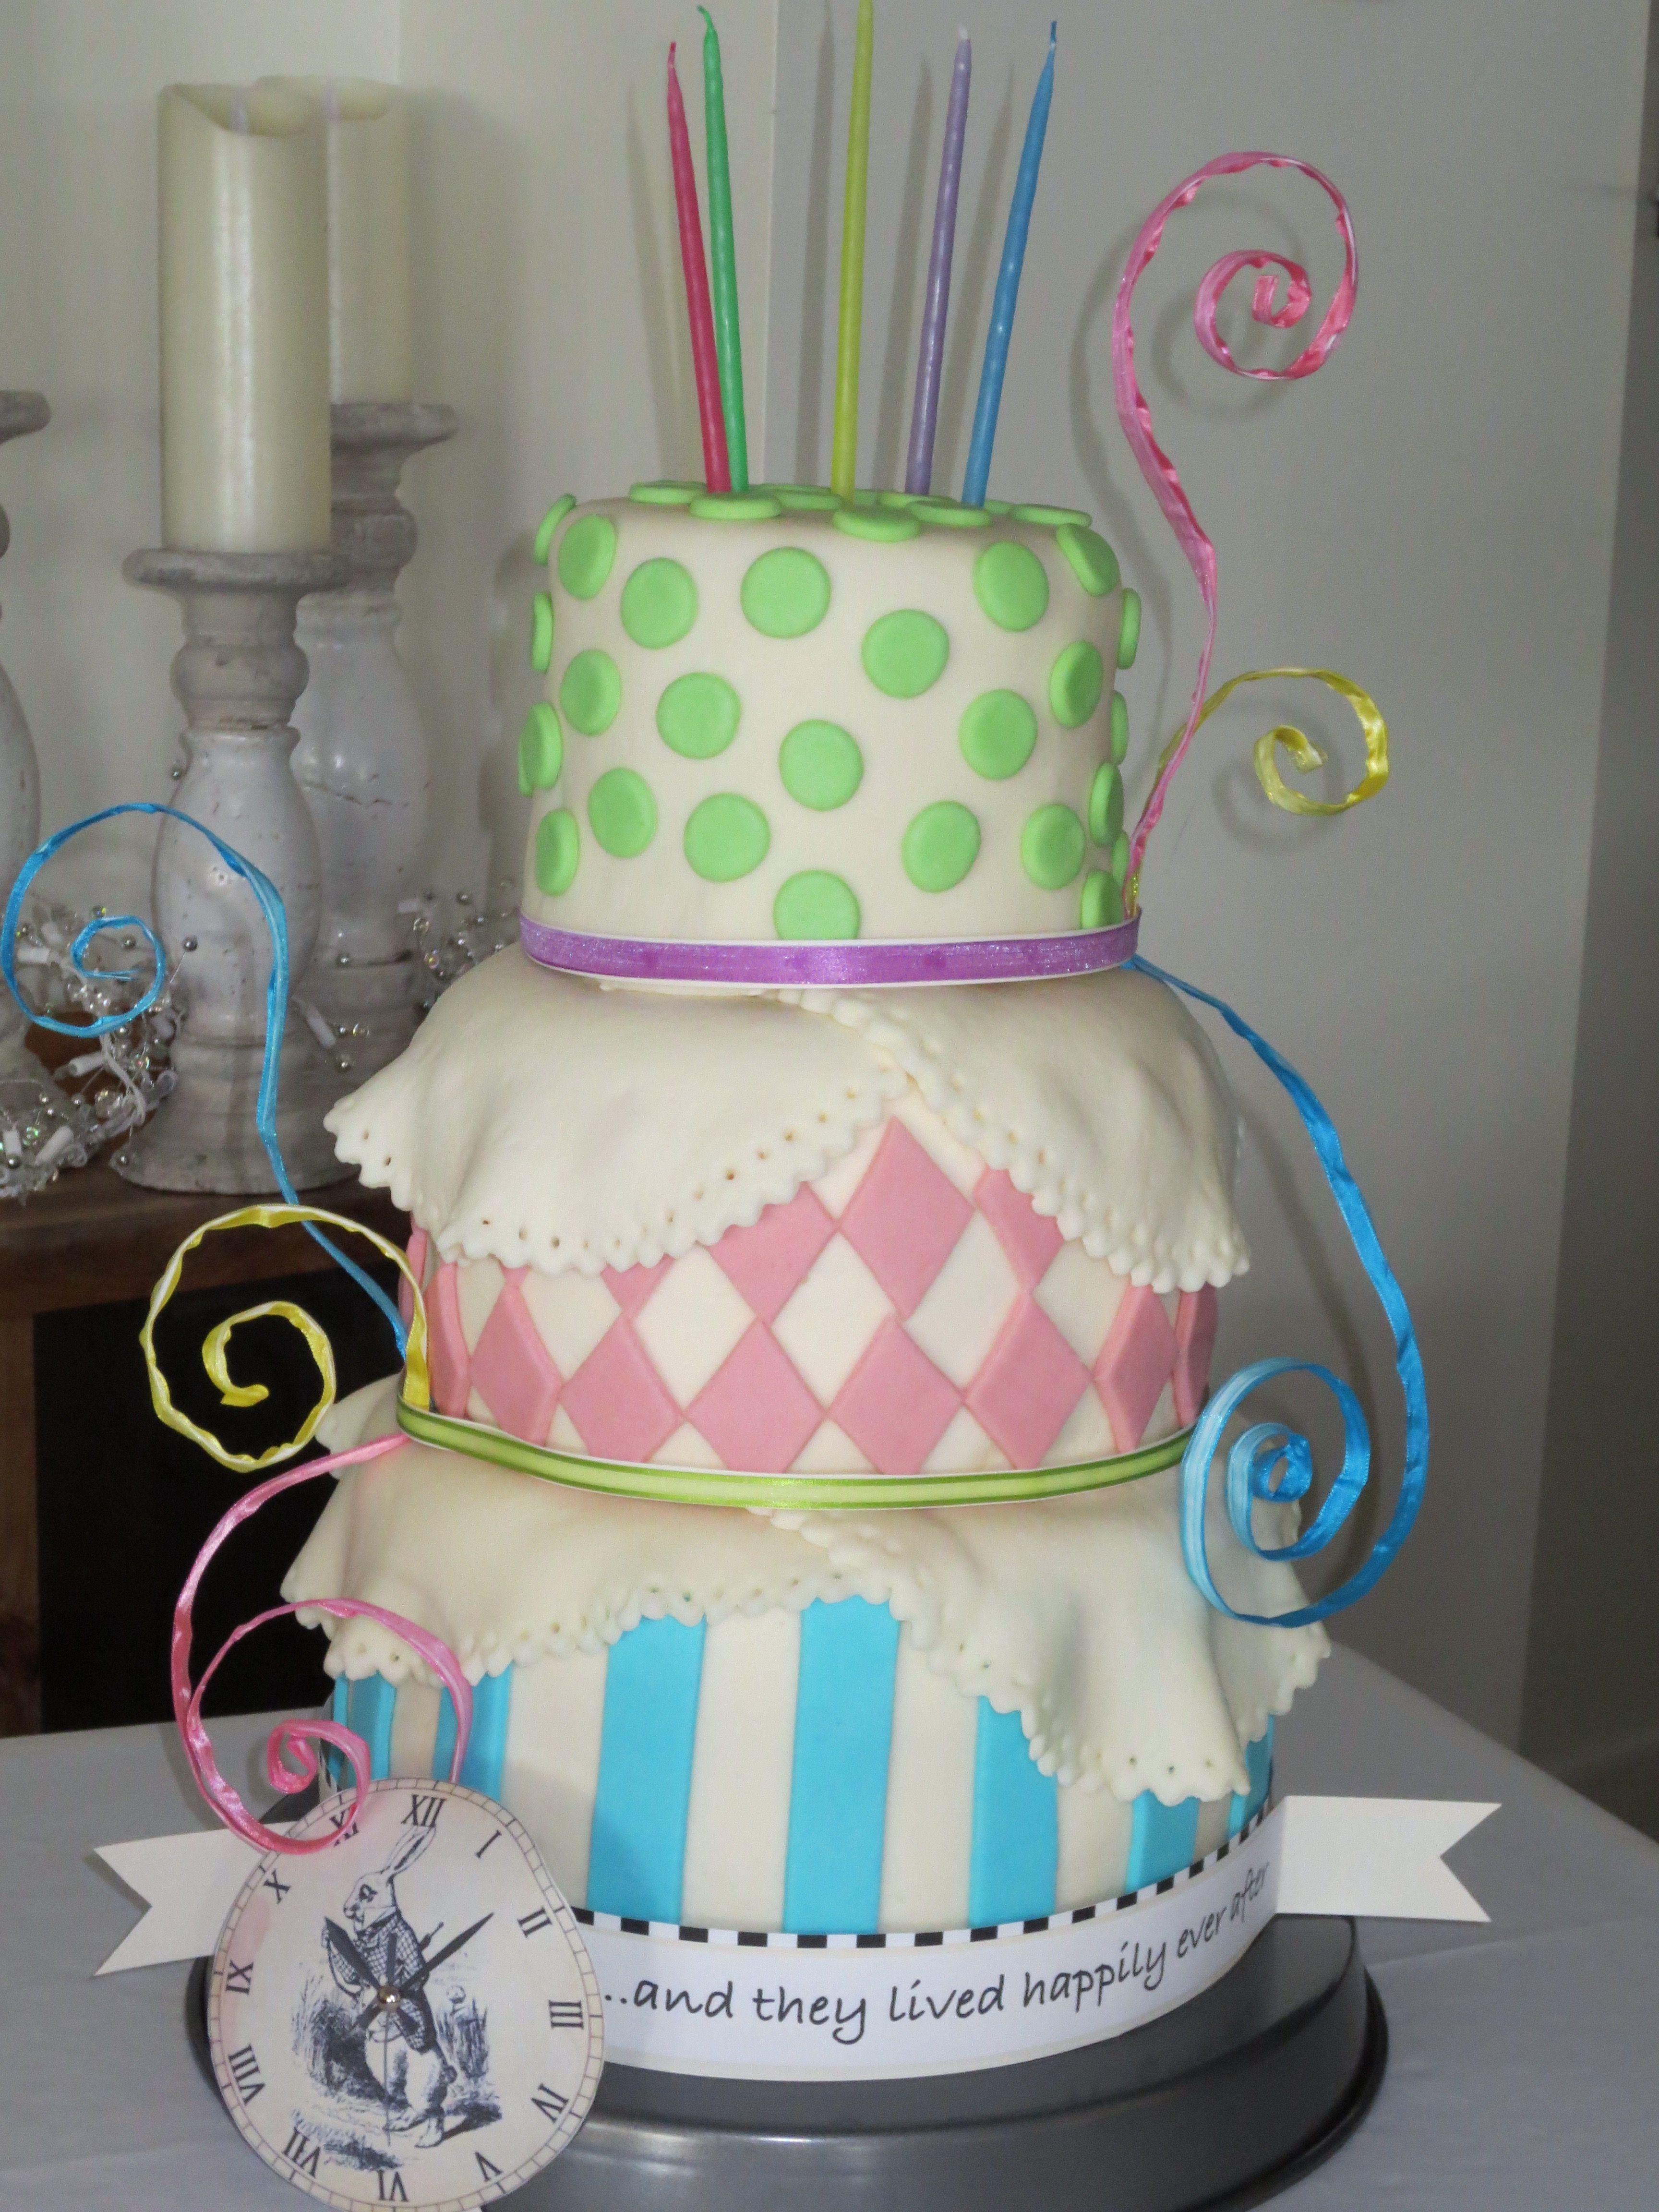 Wes and Vicki's Wedding Cake  Alice in Wonderland theme